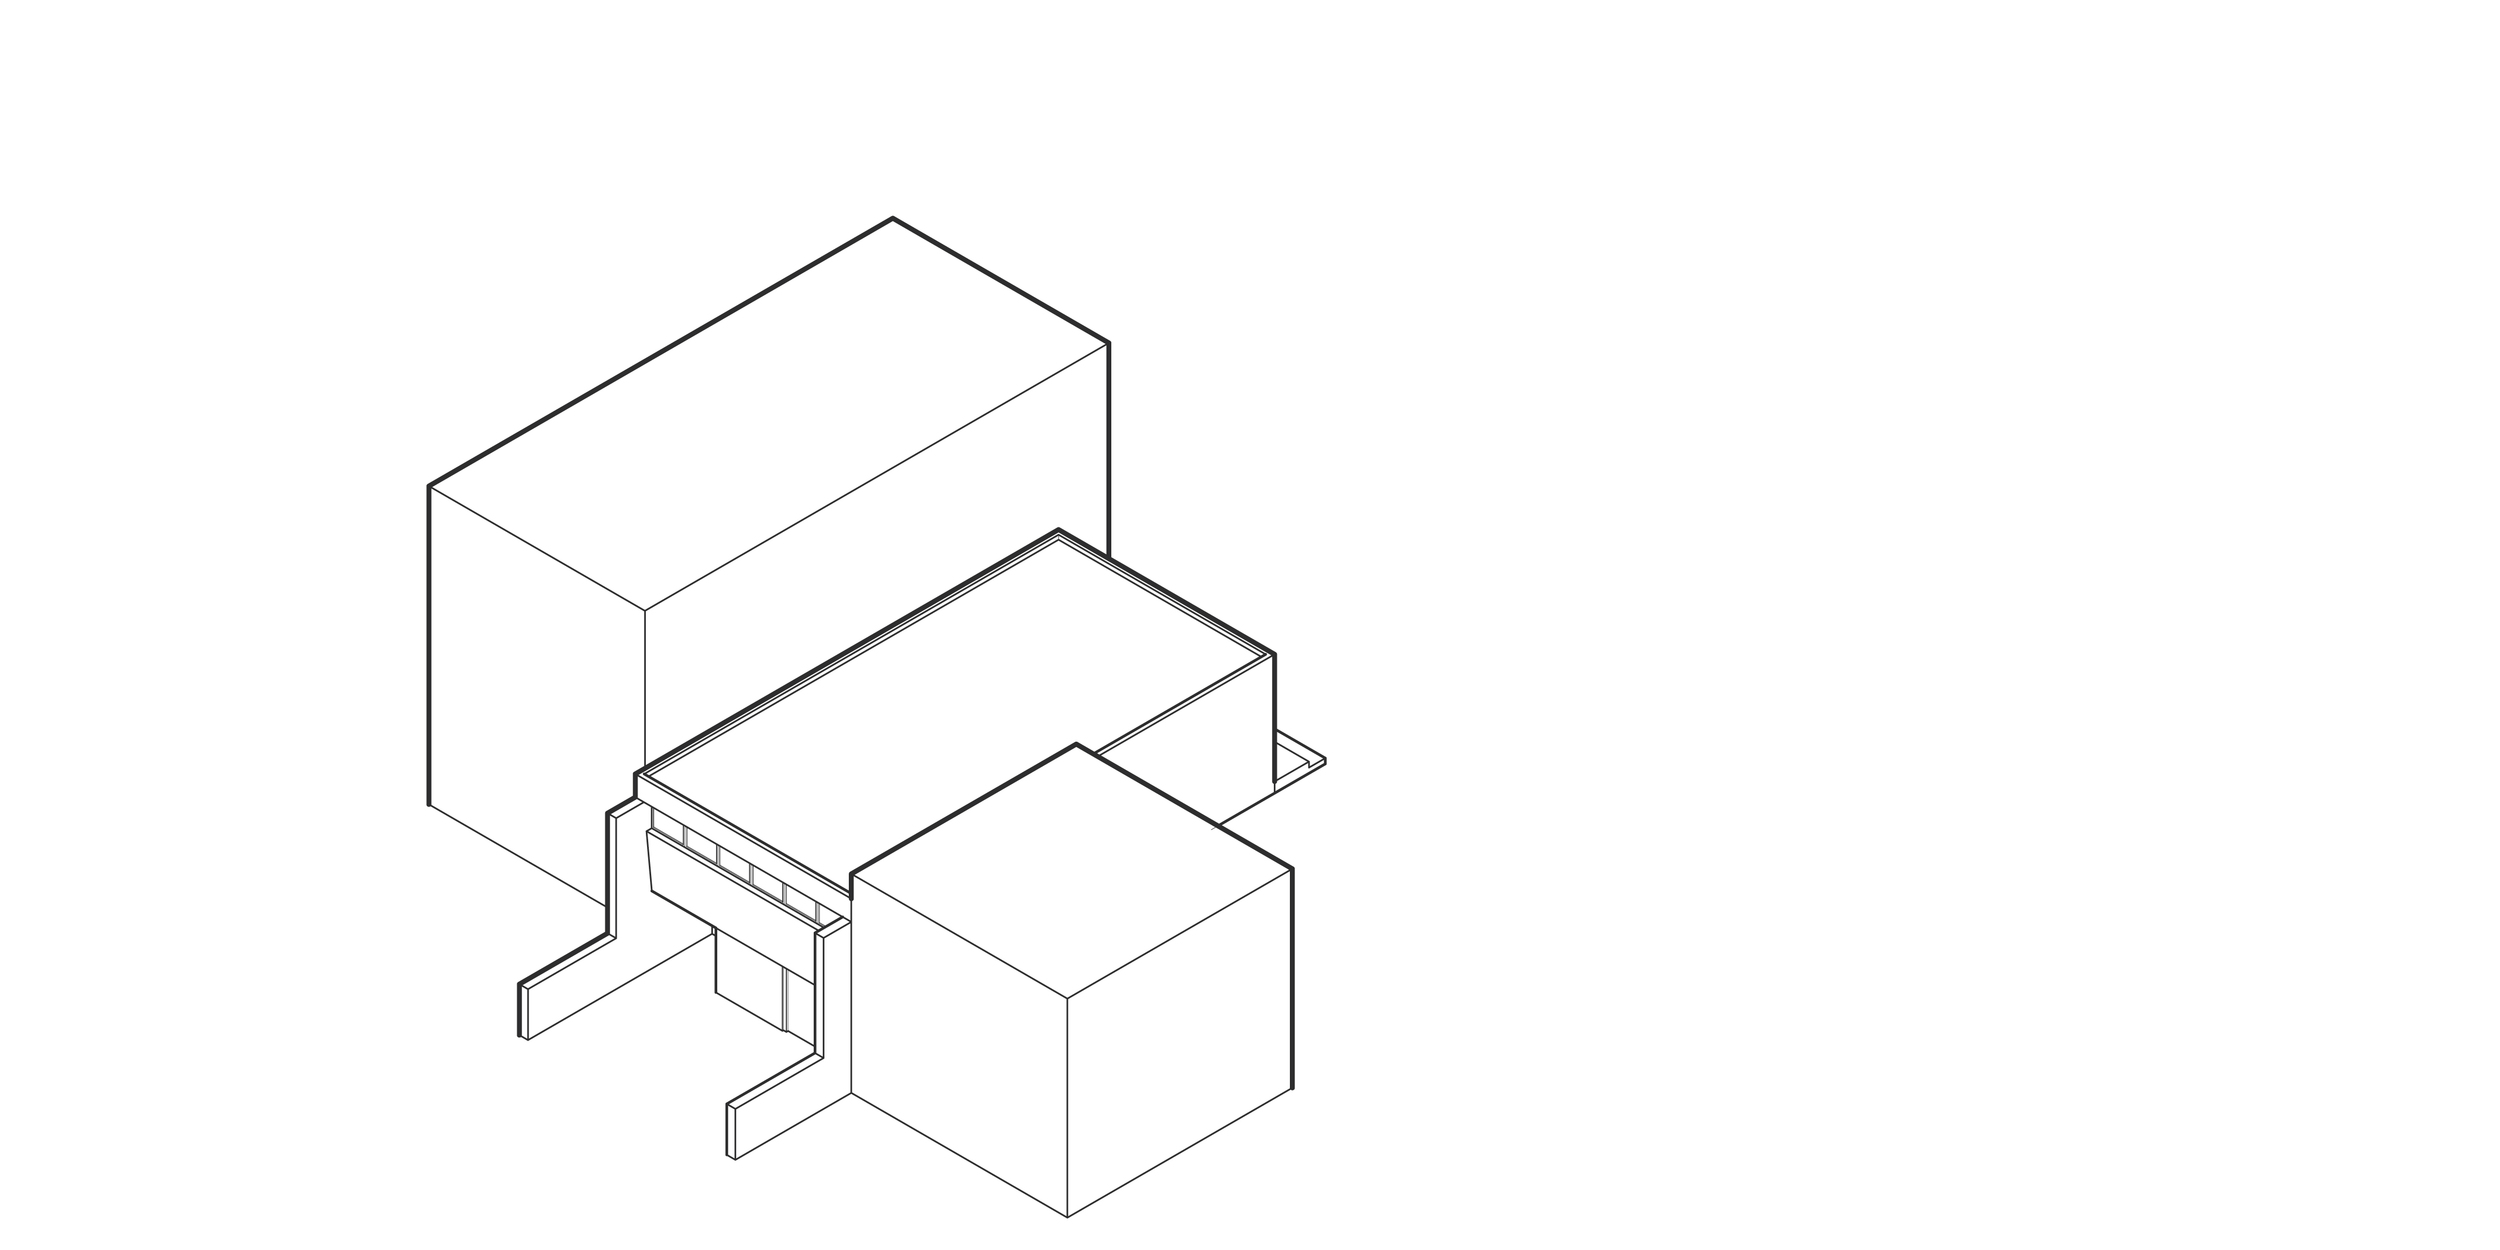 57_Highland-160413-Diagram-01-01.jpg